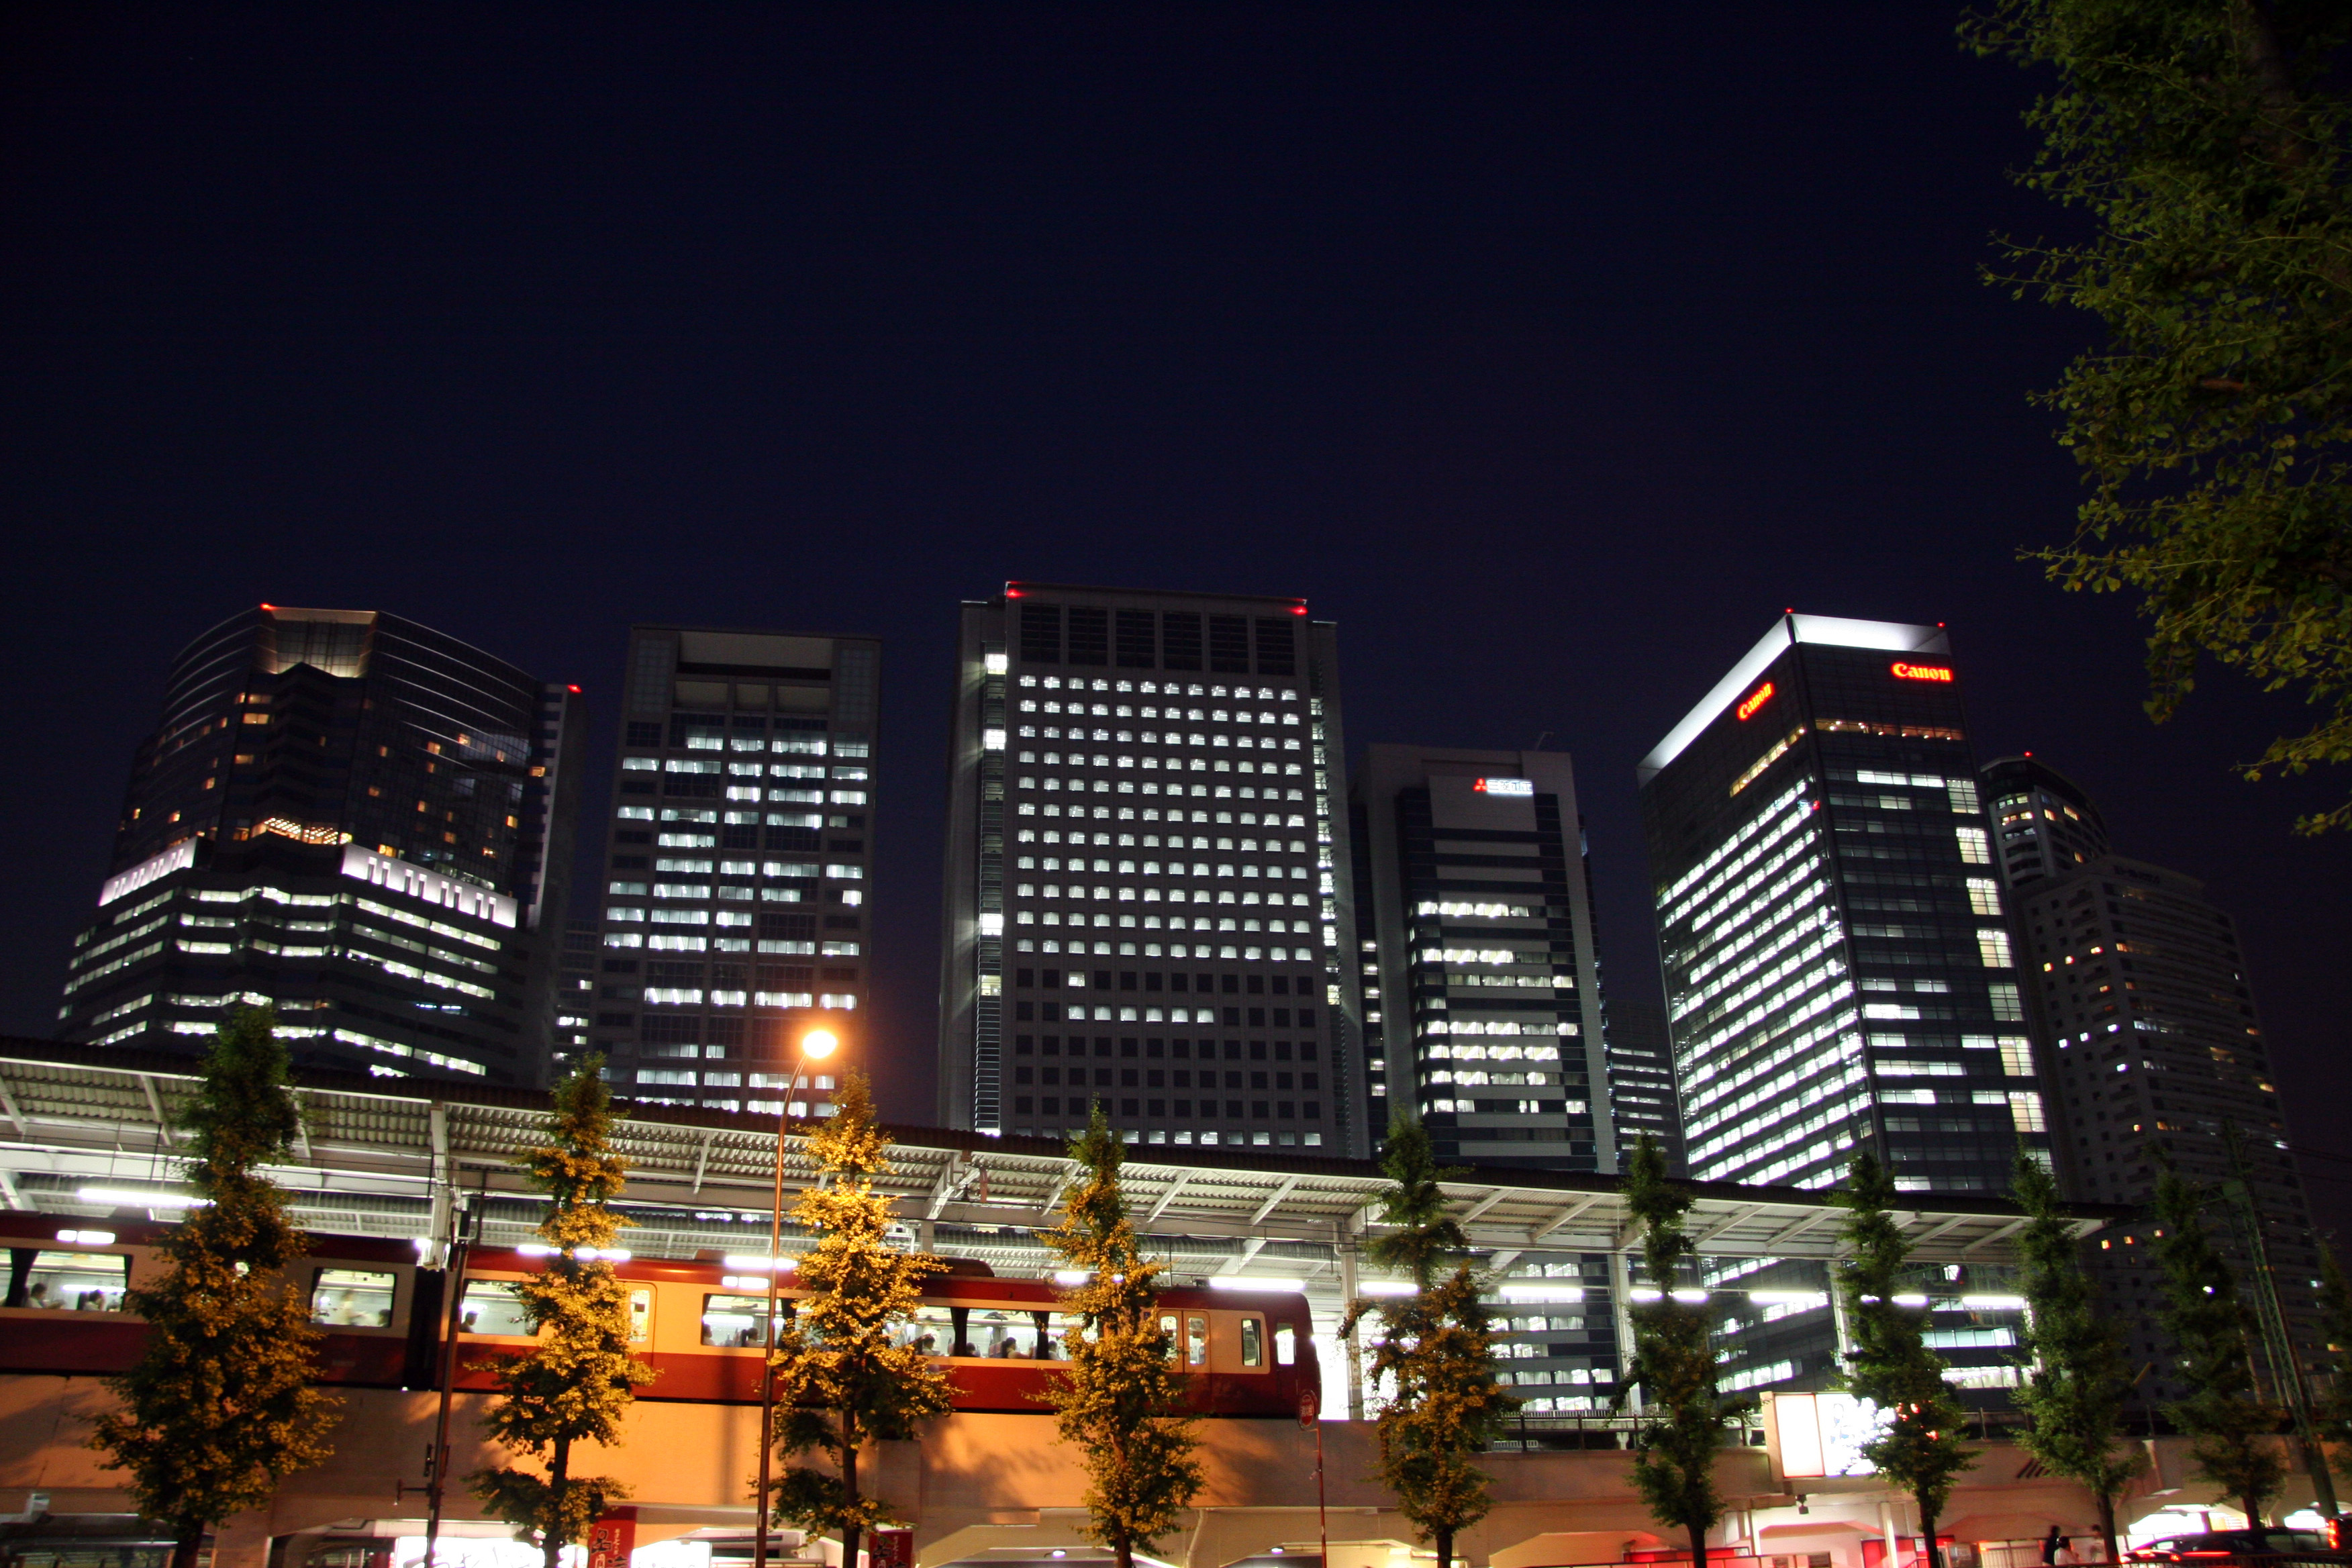 File:Shinagawa,Tokyo,Japan.jpg - Wikimedia Commons